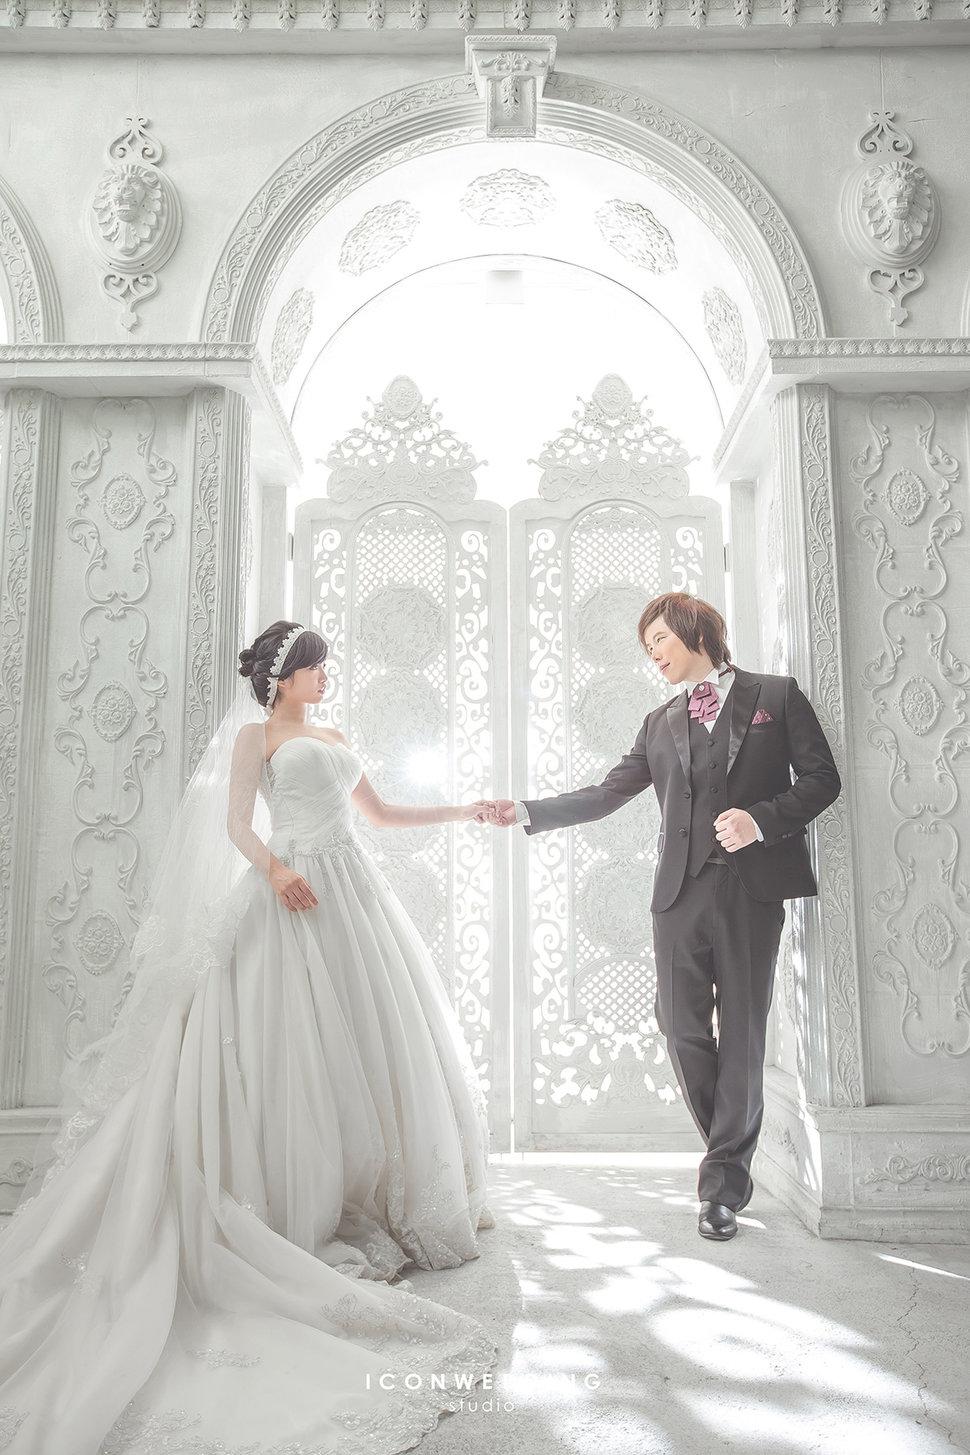 AD7X6733 - 愛情符號 ‧ 玩拍婚紗 ‧ 海外婚紗 - 結婚吧